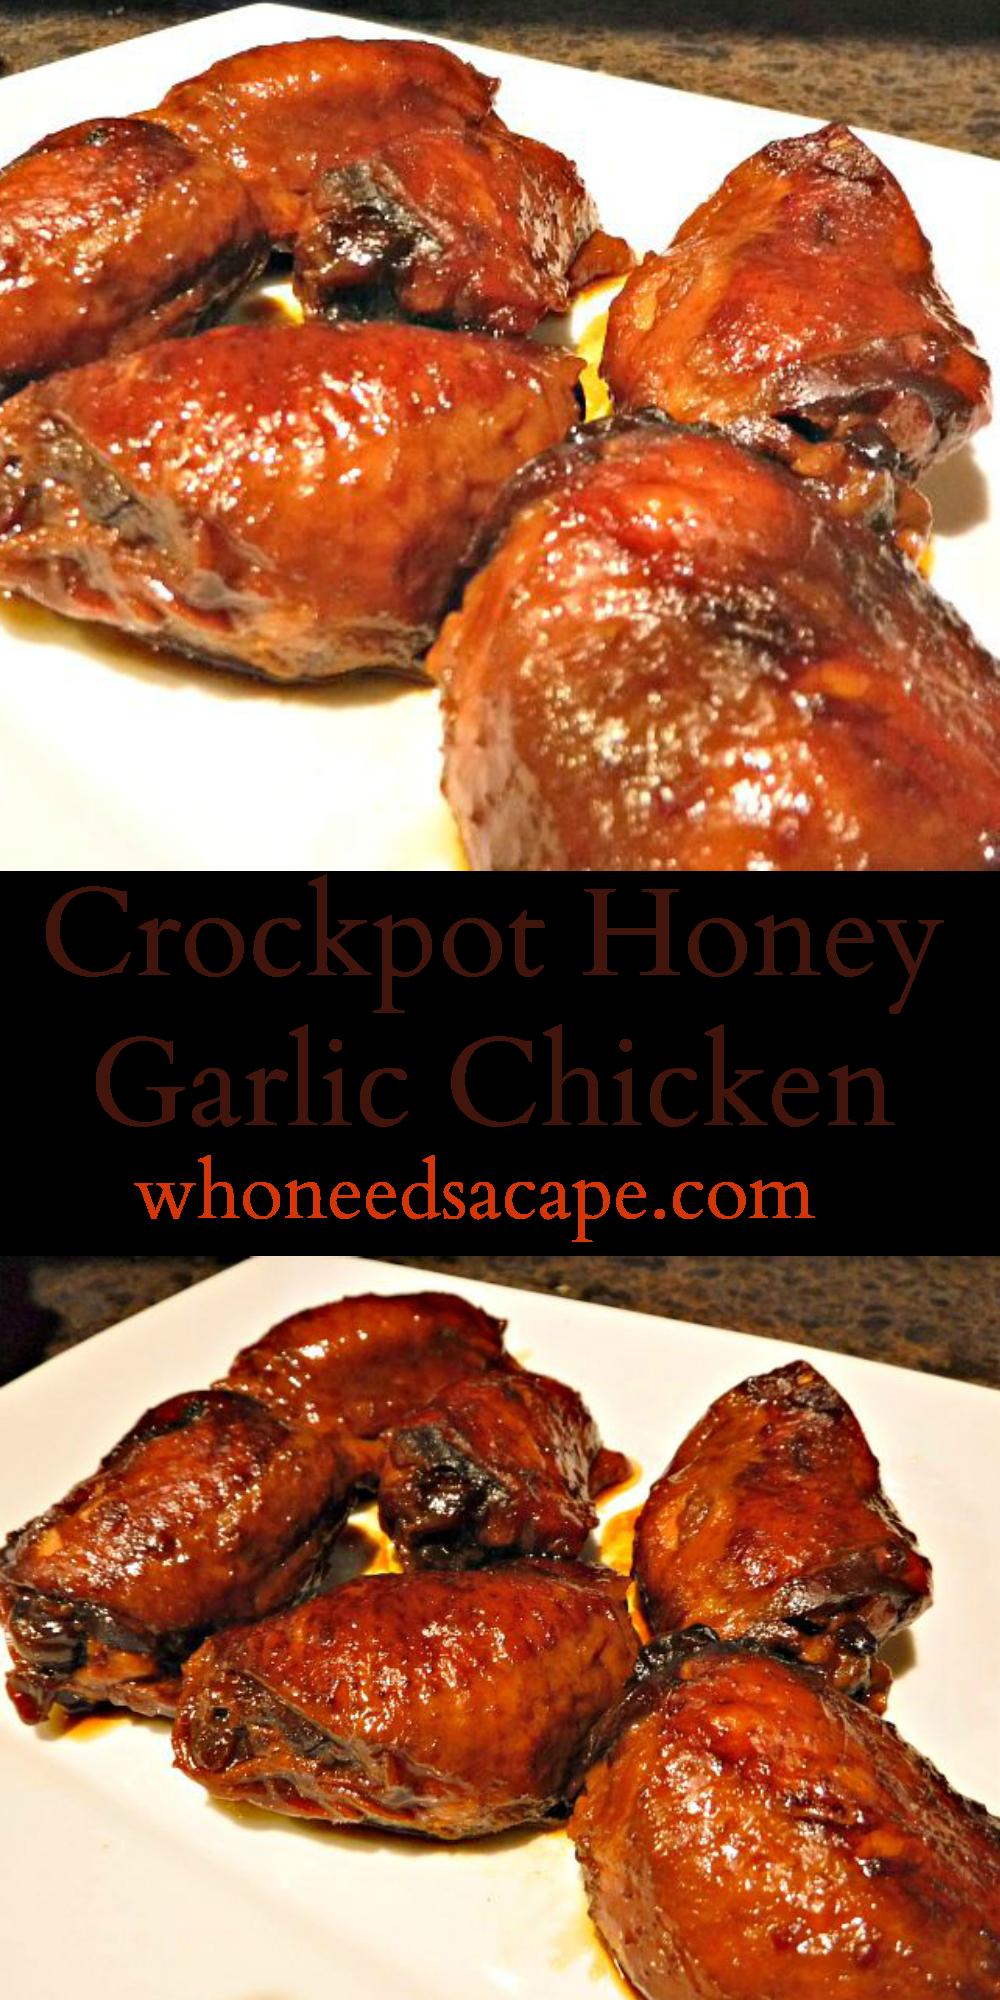 Crockpot Honey Garlic Chicken Who Needs A Cape